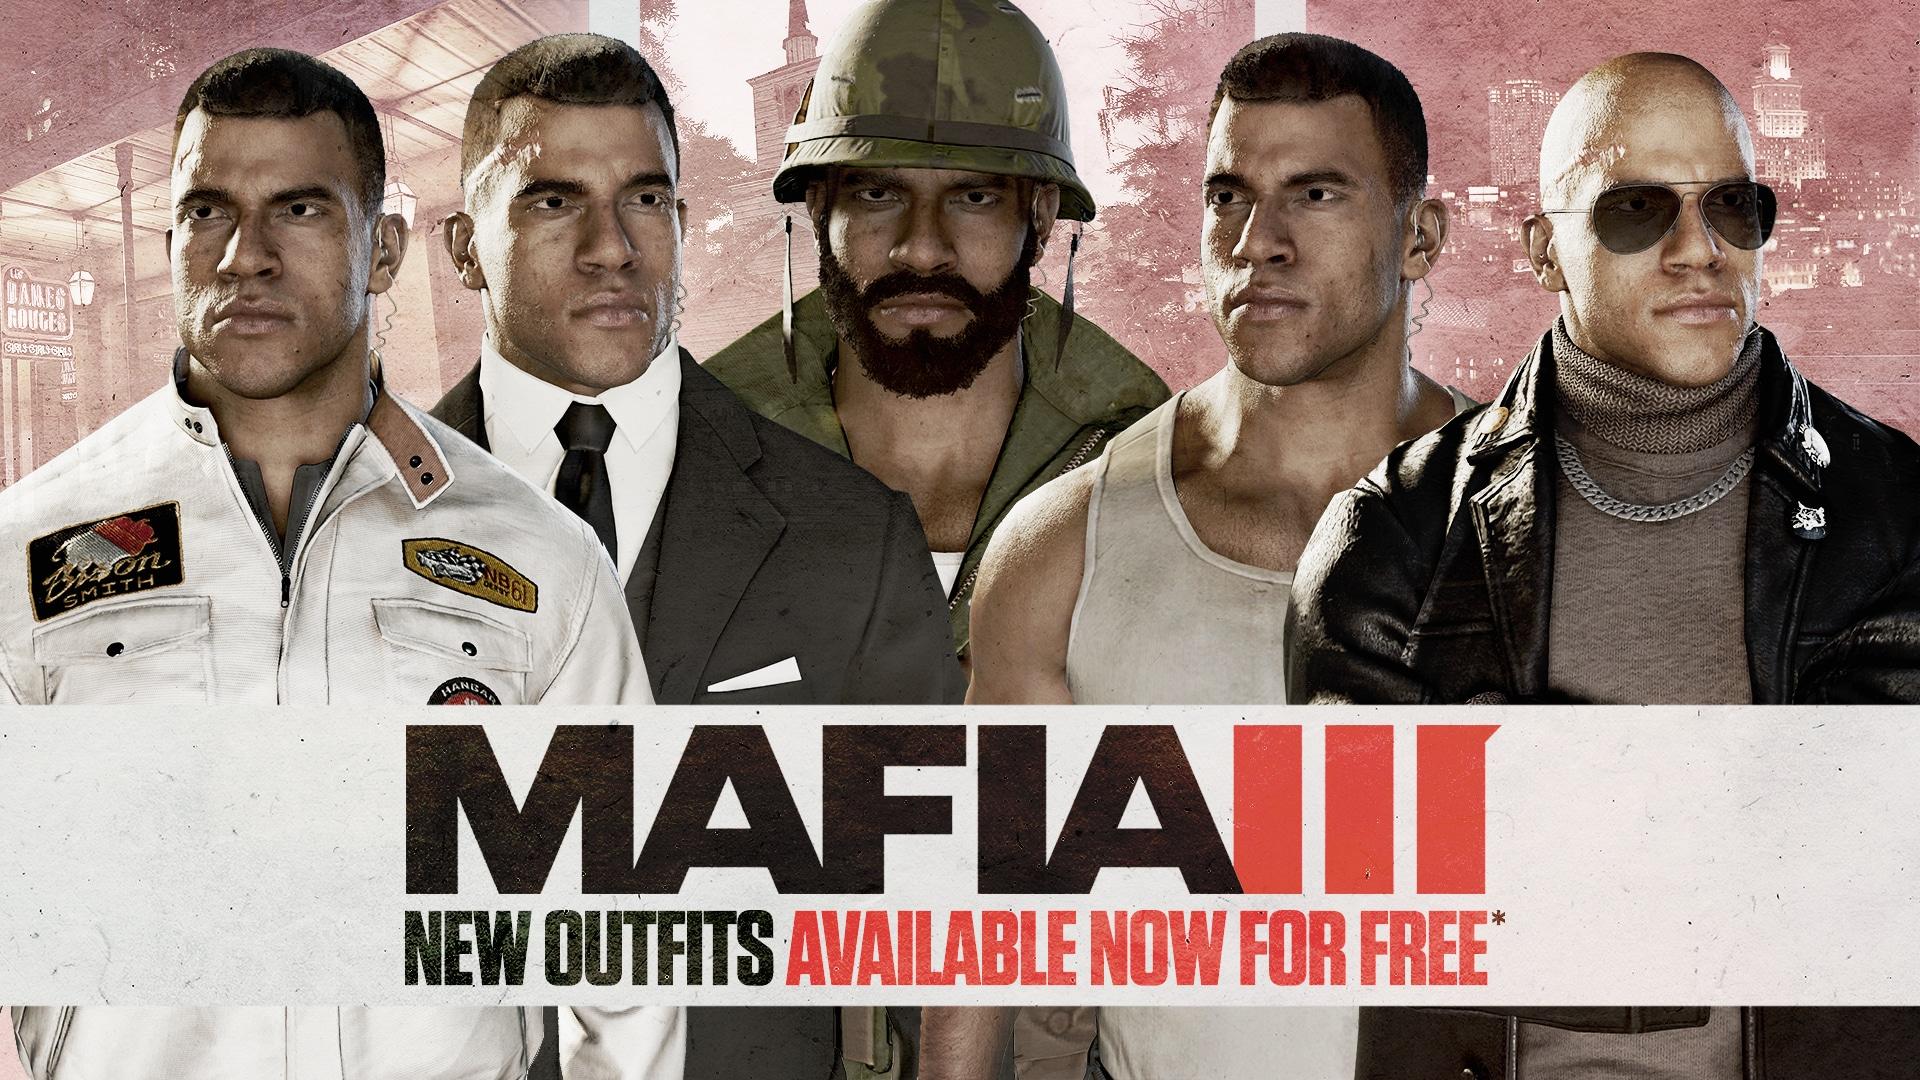 Photo of Mafia 3: Kostenloser DLC bringt 11 auswählbare Outfits